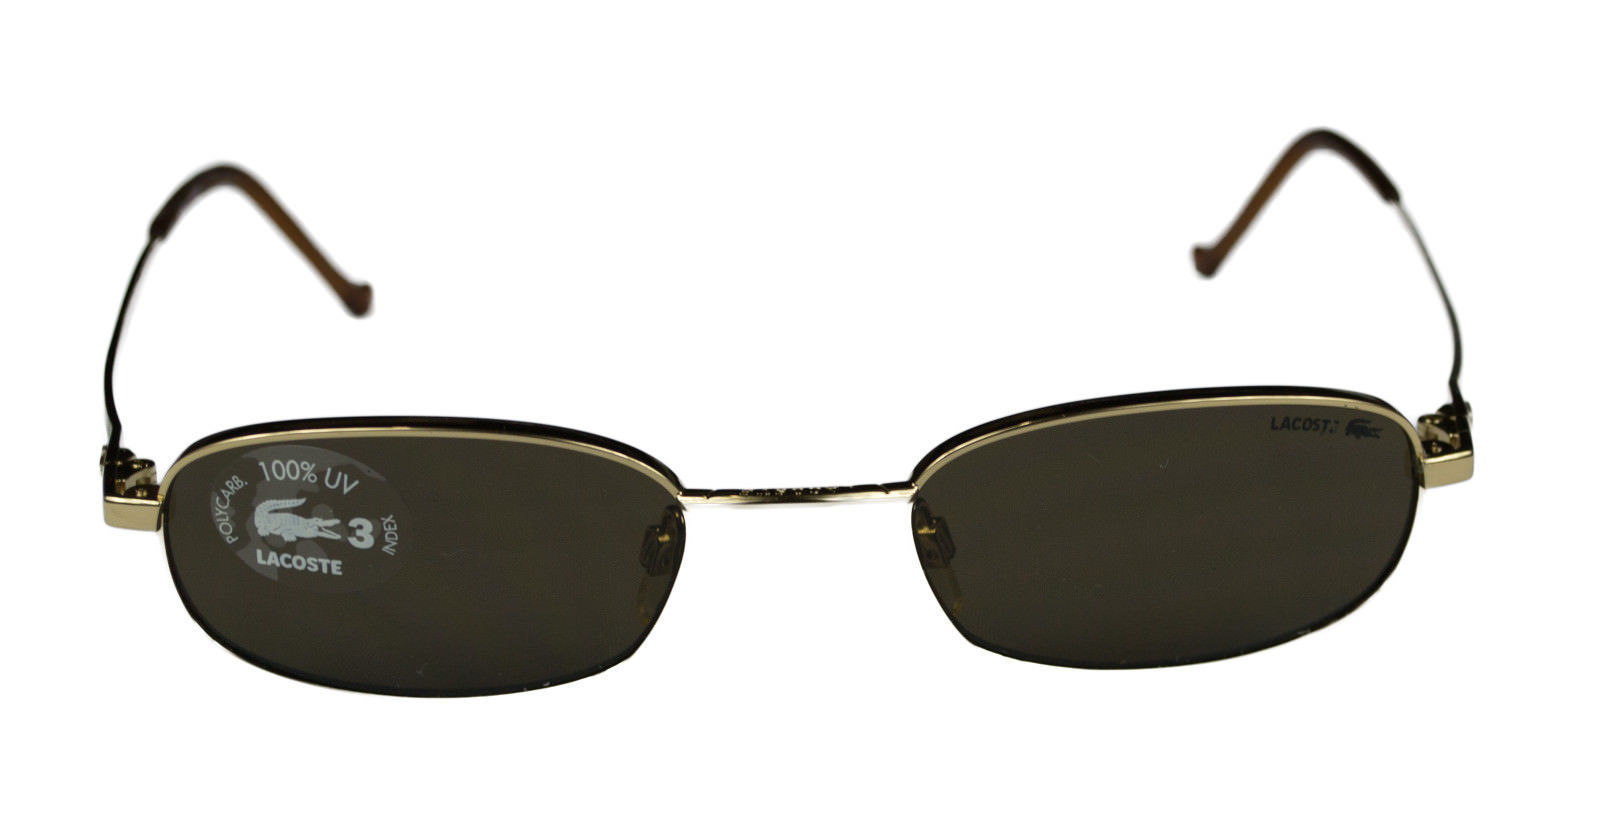 df81df2f44fcb Lacoste Vintage 90 s Sunglasses - AV 1431 and 50 similar items